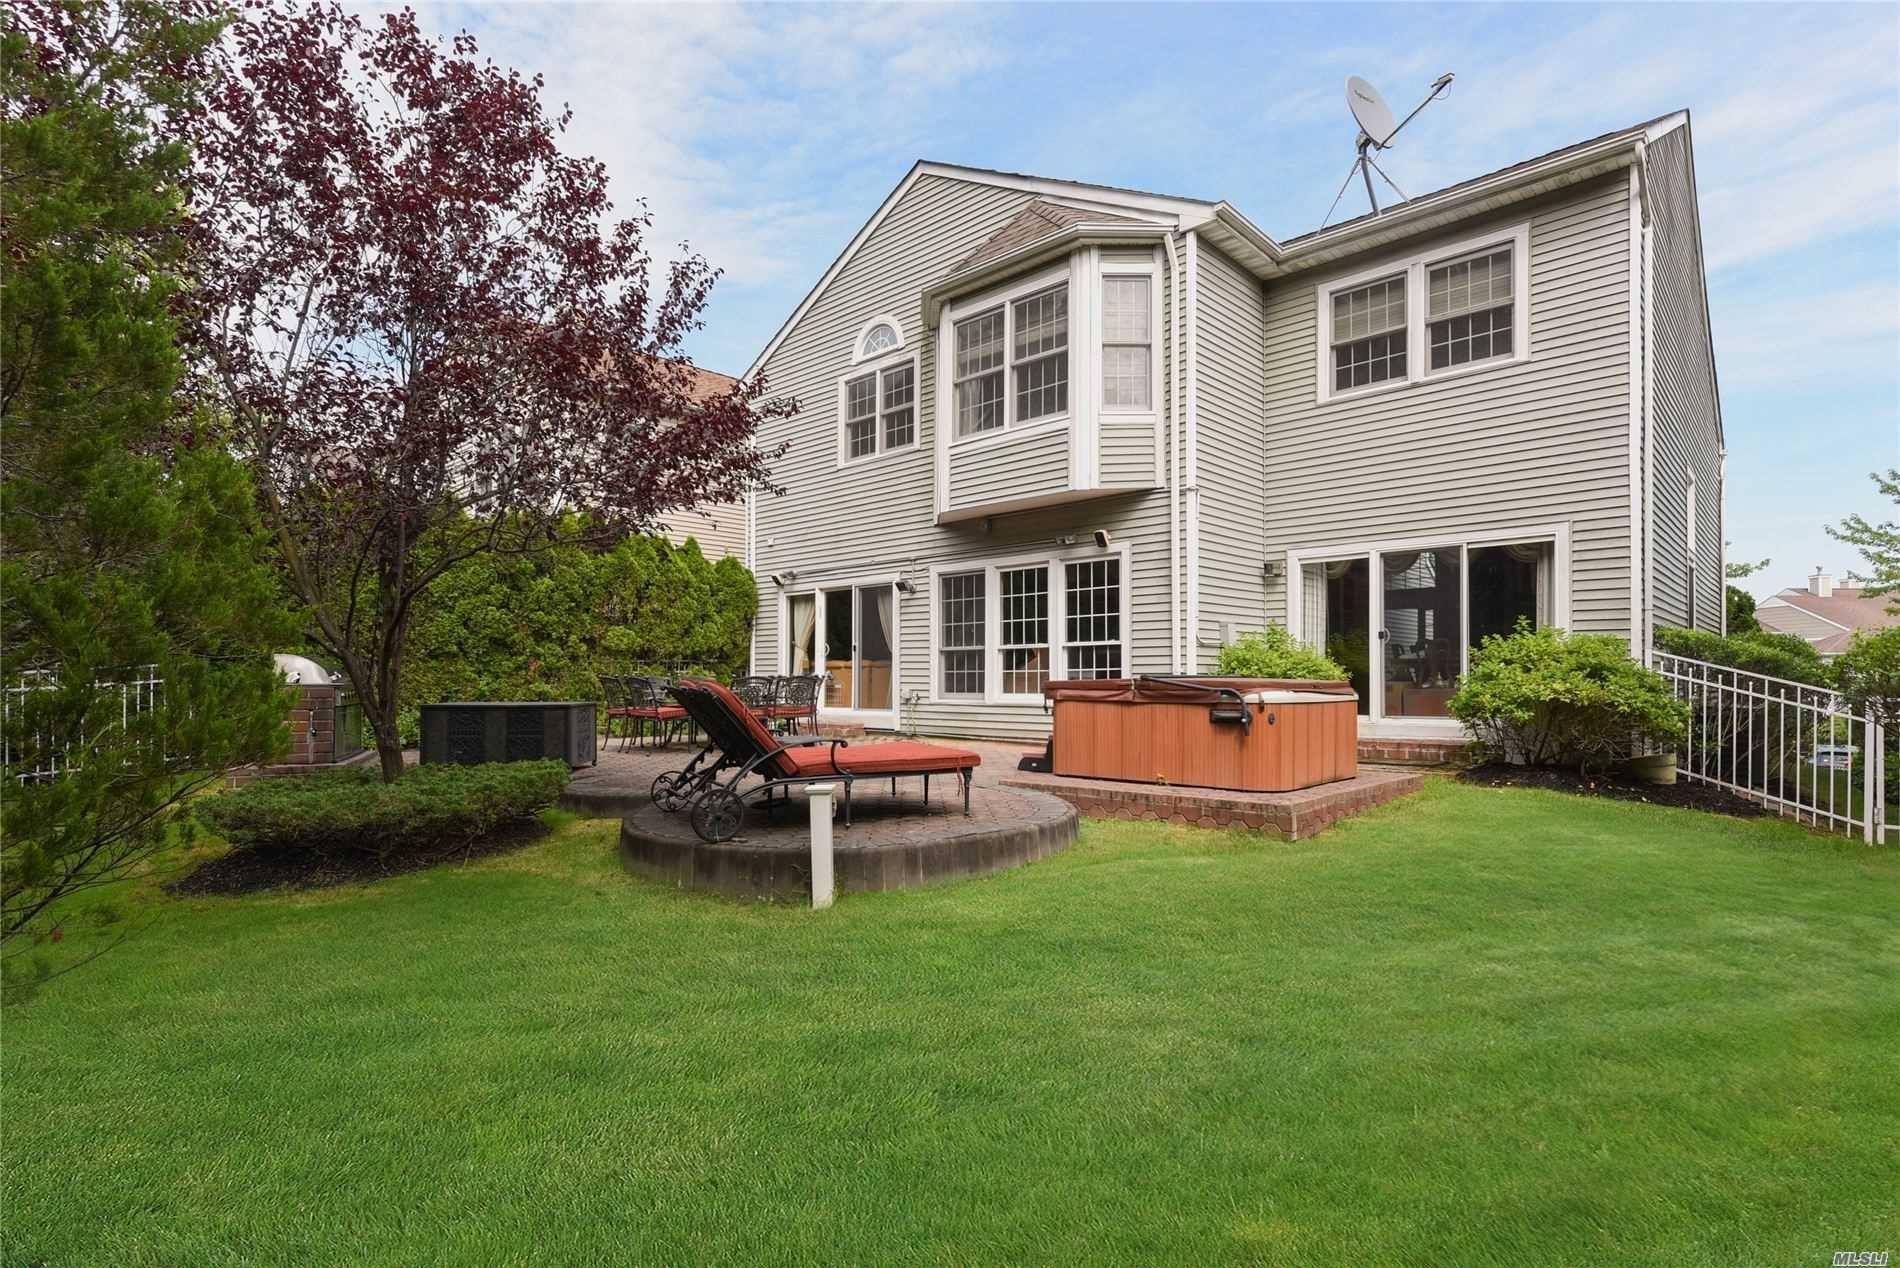 126 Sagamore Dr, Plainview, NY 11803 - MLS#: 3240788